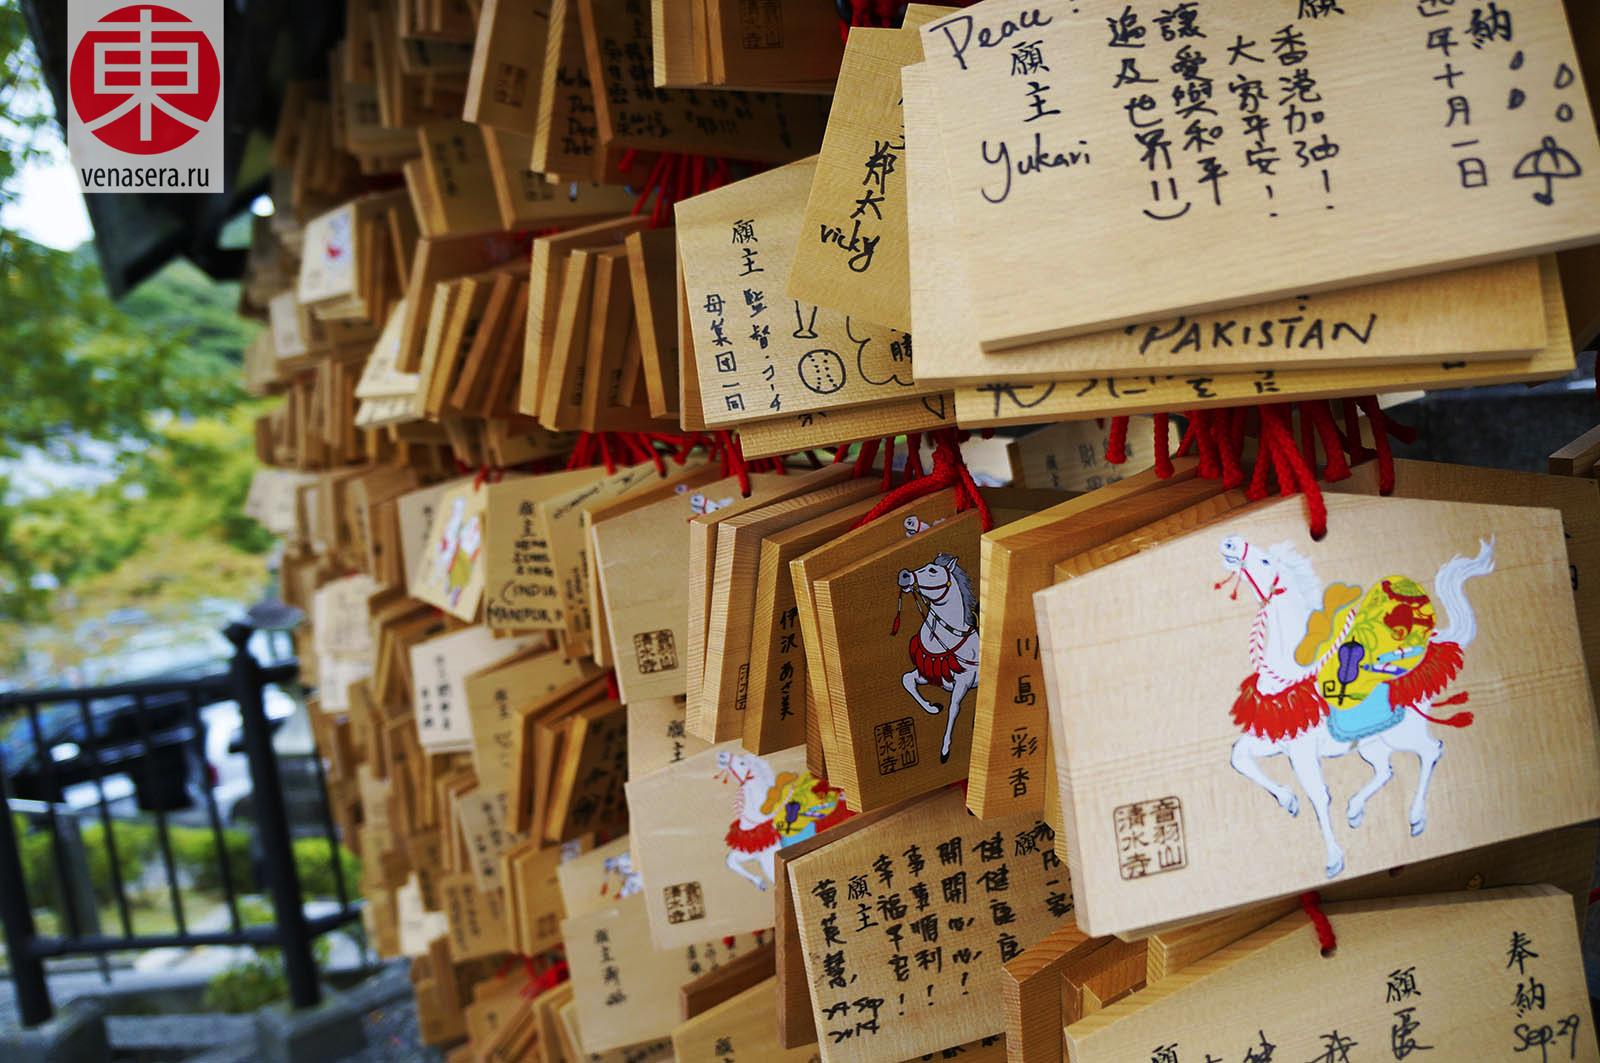 Эма с пожеланиями, Храм Киёмидзу-дэра в Киото, 清水寺, Киото, Kyoto, 京都, Япония, Japan, 日本.